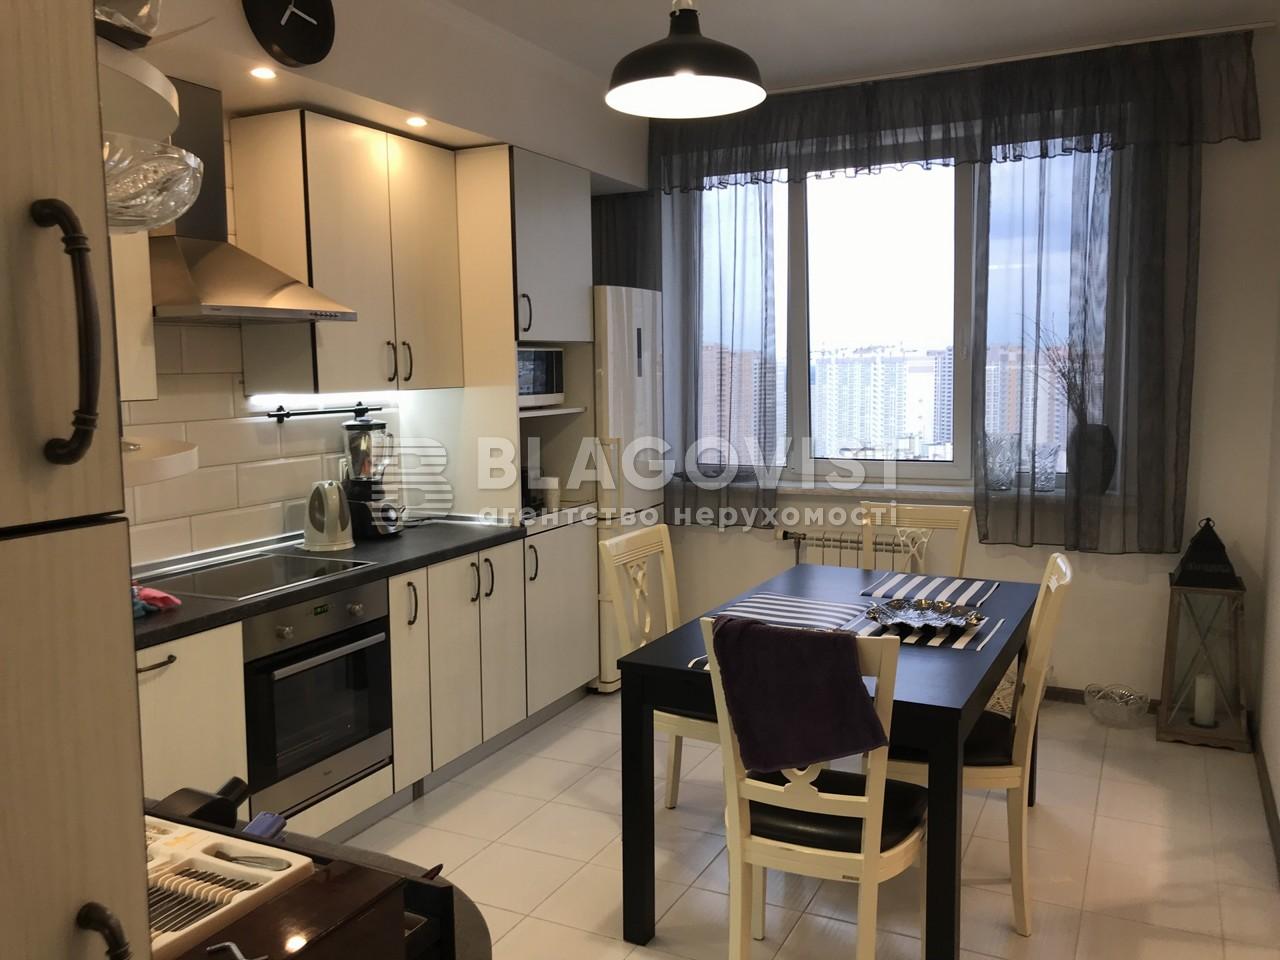 Квартира R-39864, Гришко Михаила, 9, Киев - Фото 10